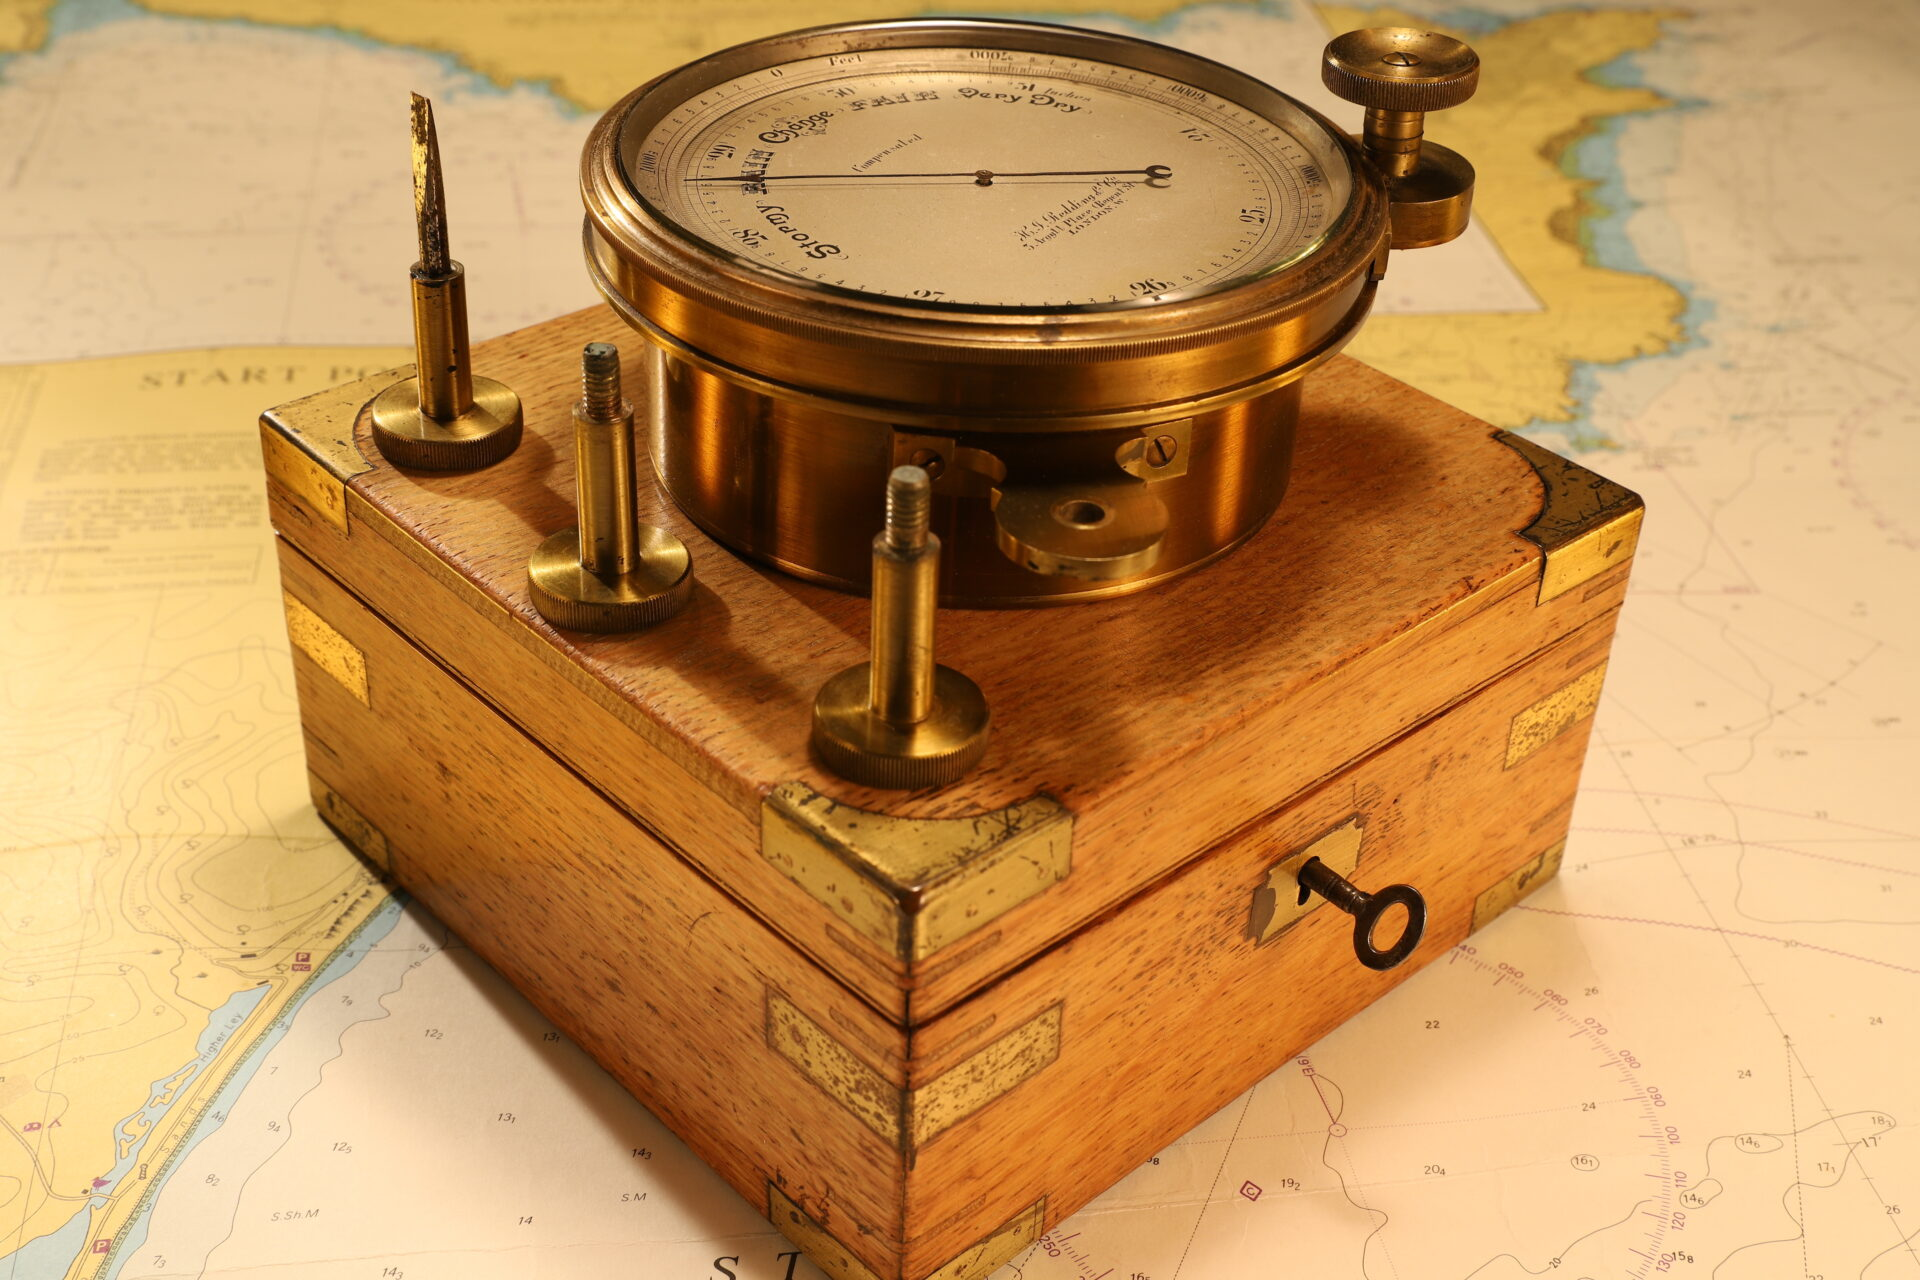 Image of Short & Mason Chart Table Barometer c1906 on closed travel case